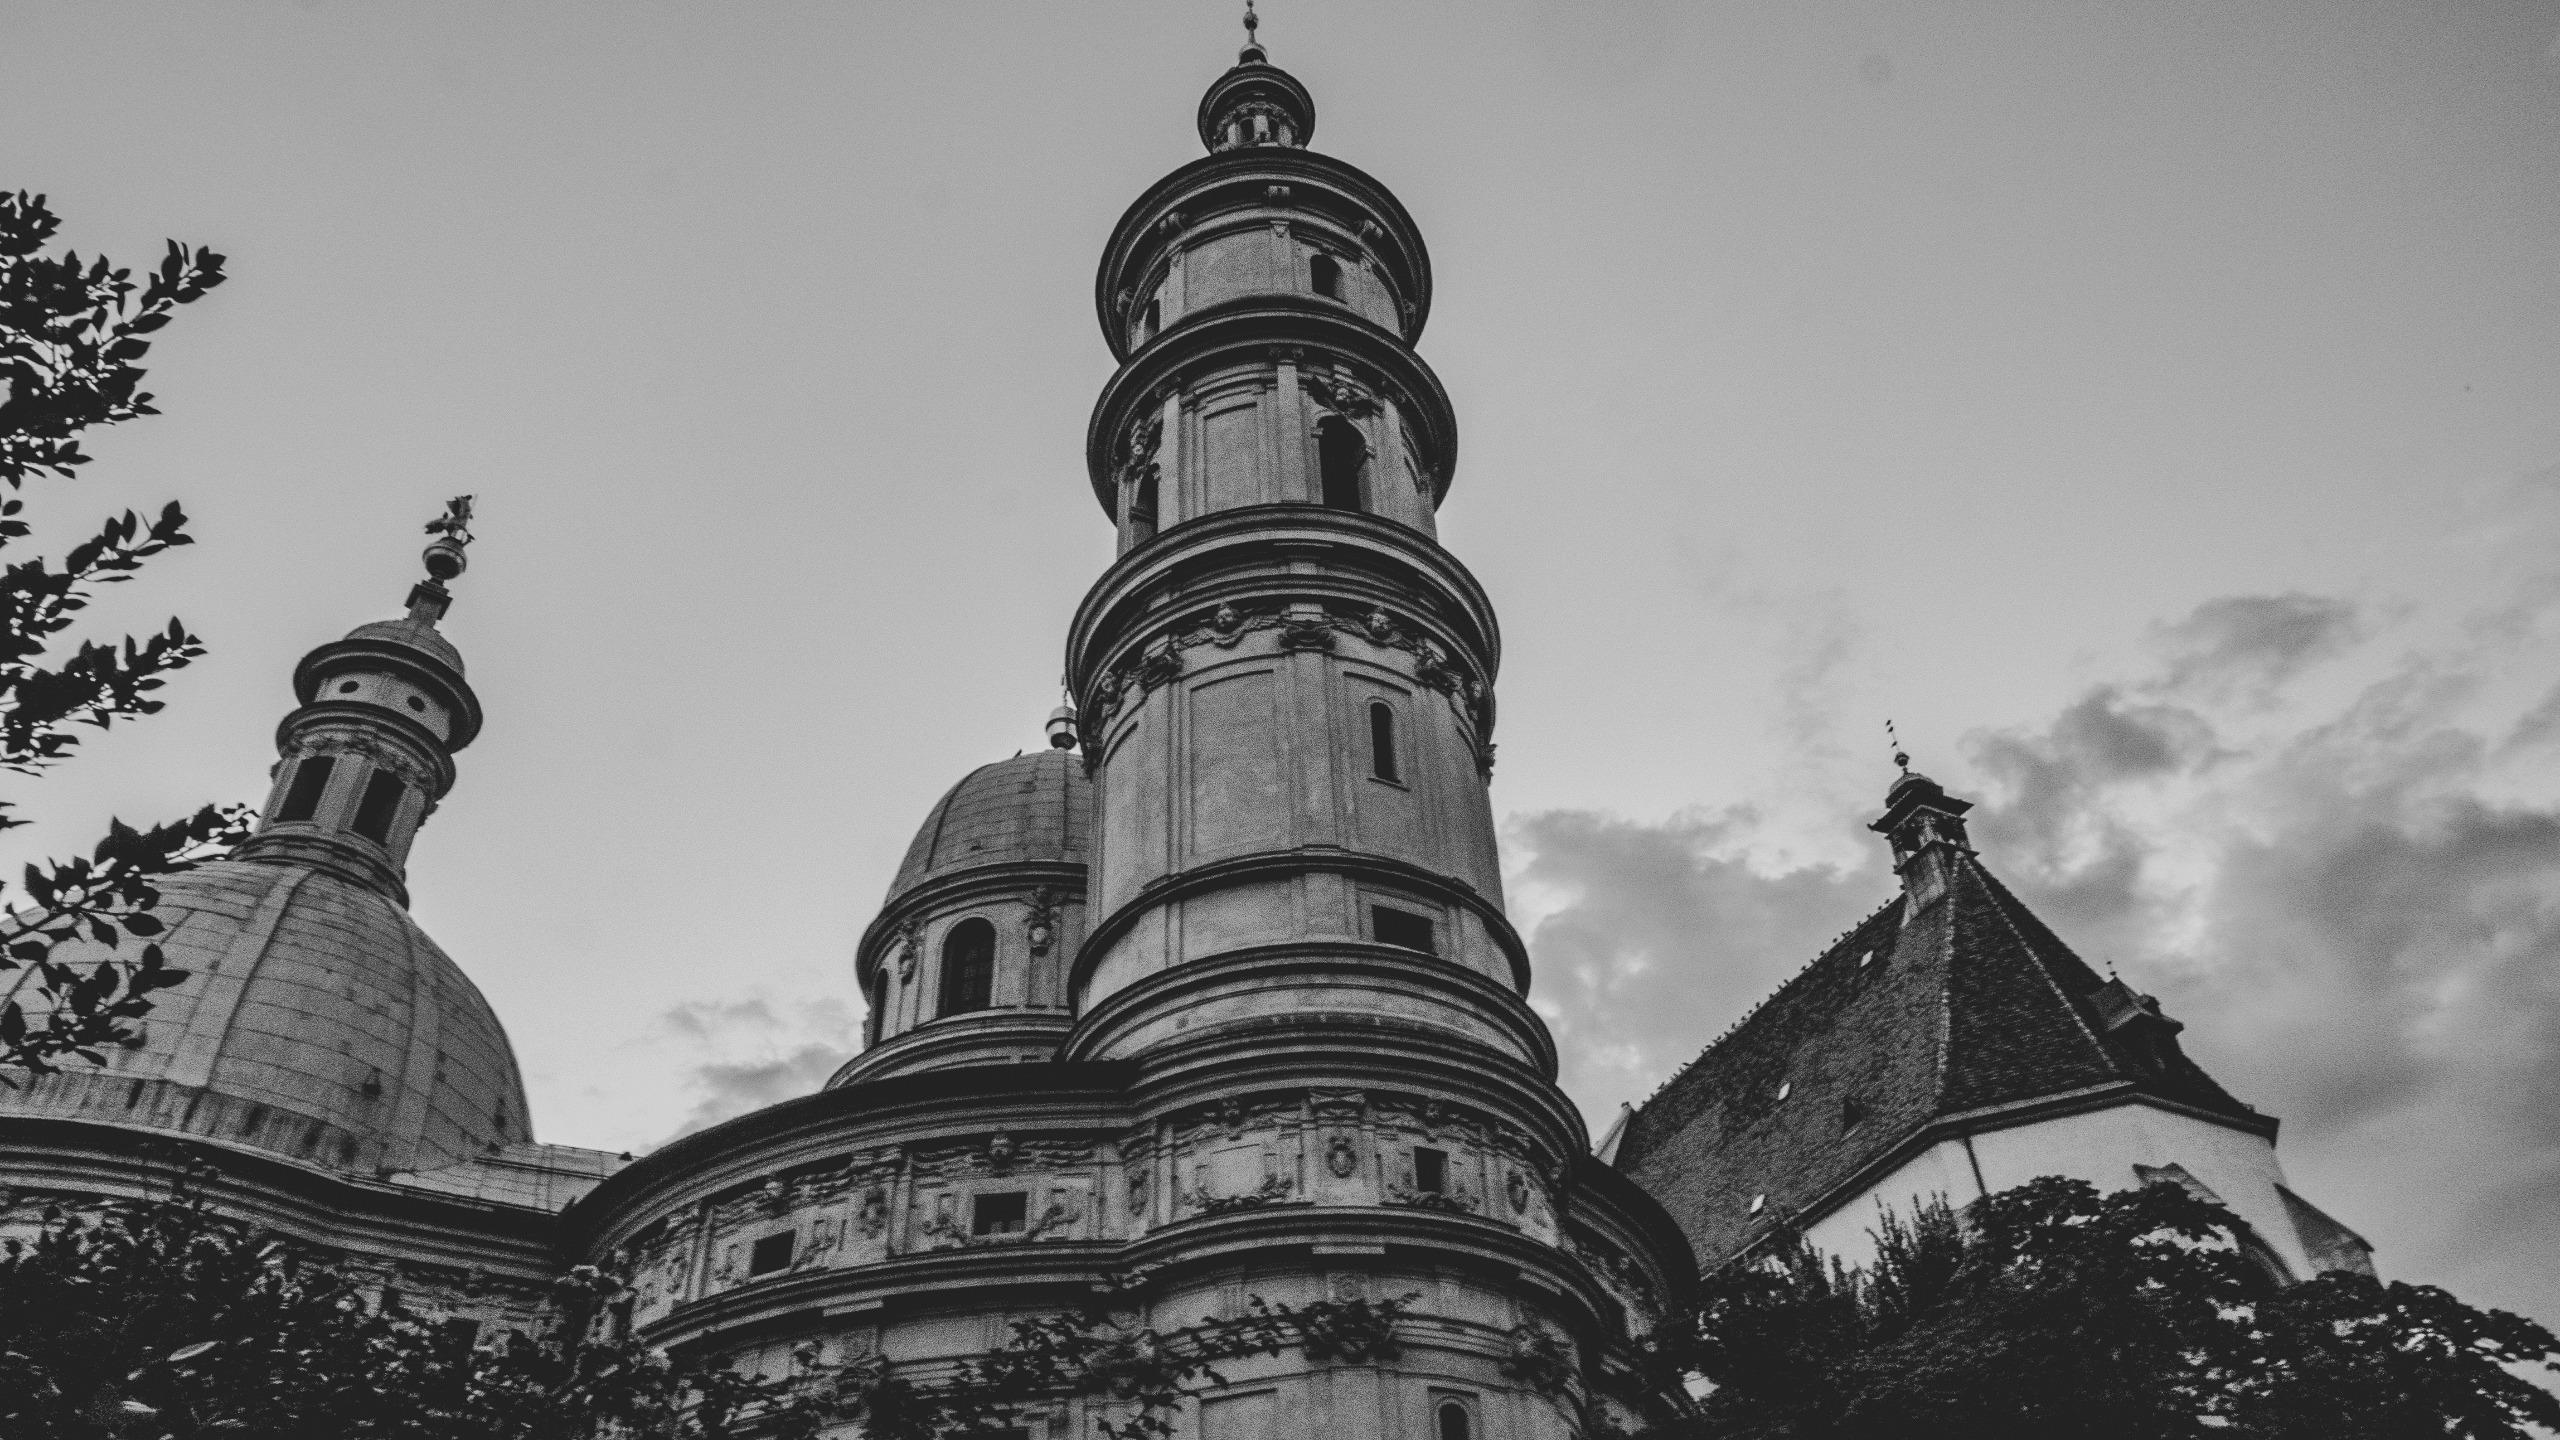 Graz Burggasse - blackandwhitephotography - marcstipsits   ello